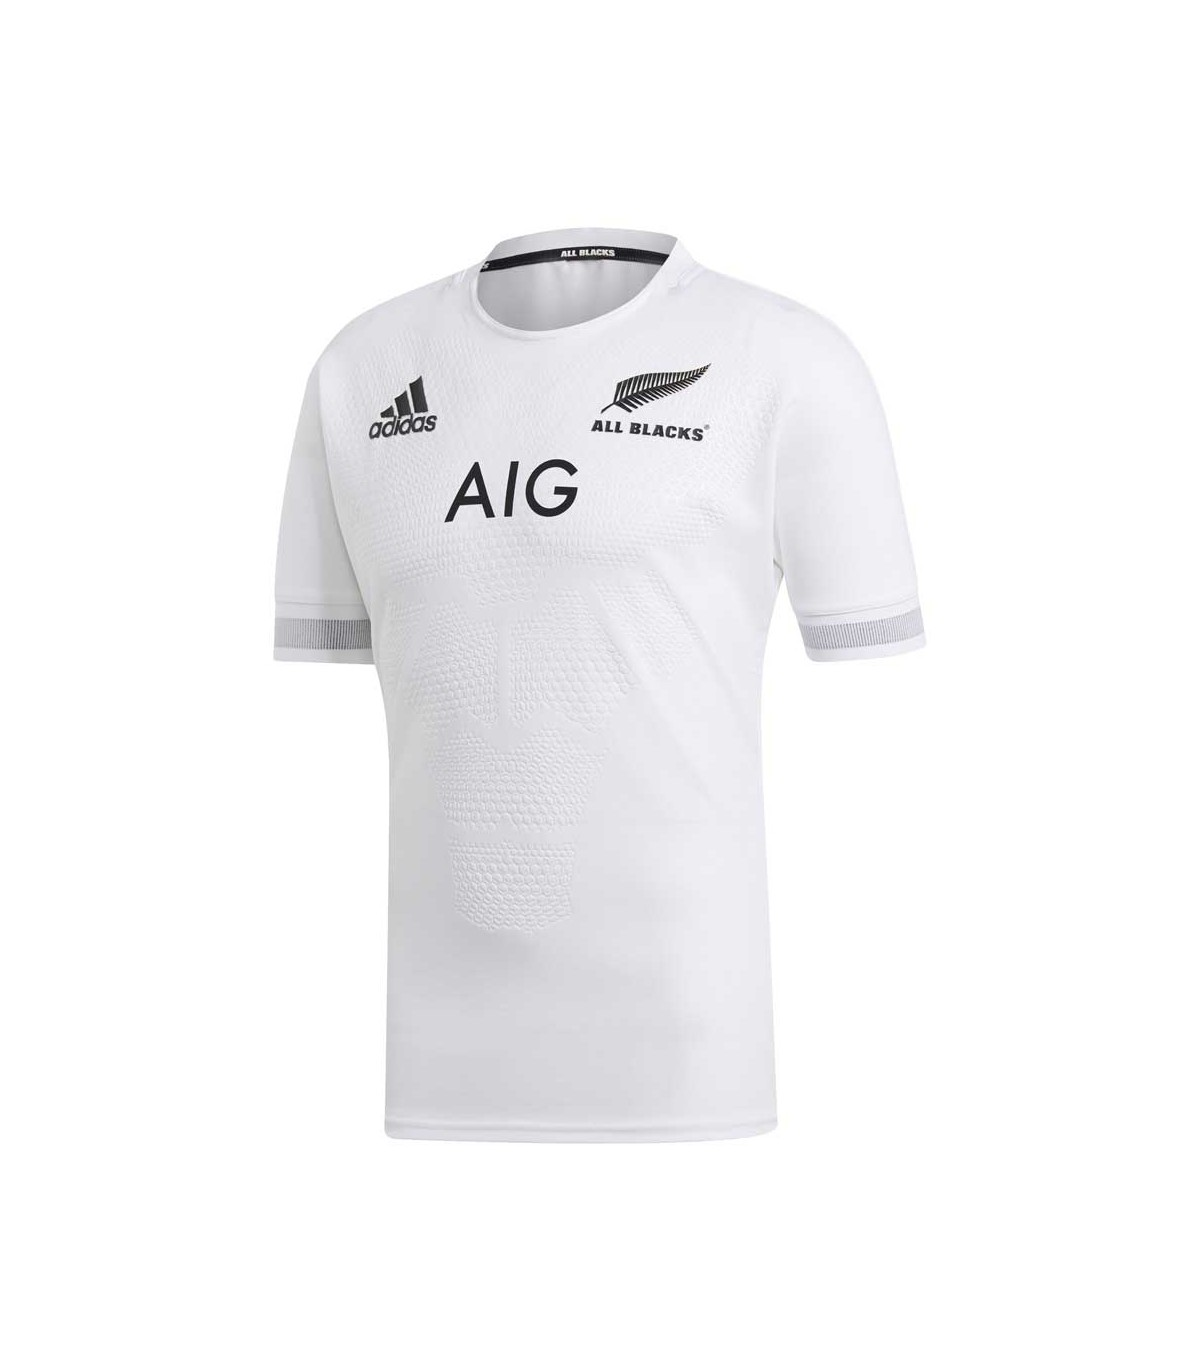 buy popular ed783 0e943 Maillot rugby All Blacks, réplica extérieur 2018/2019 adulte - adid...